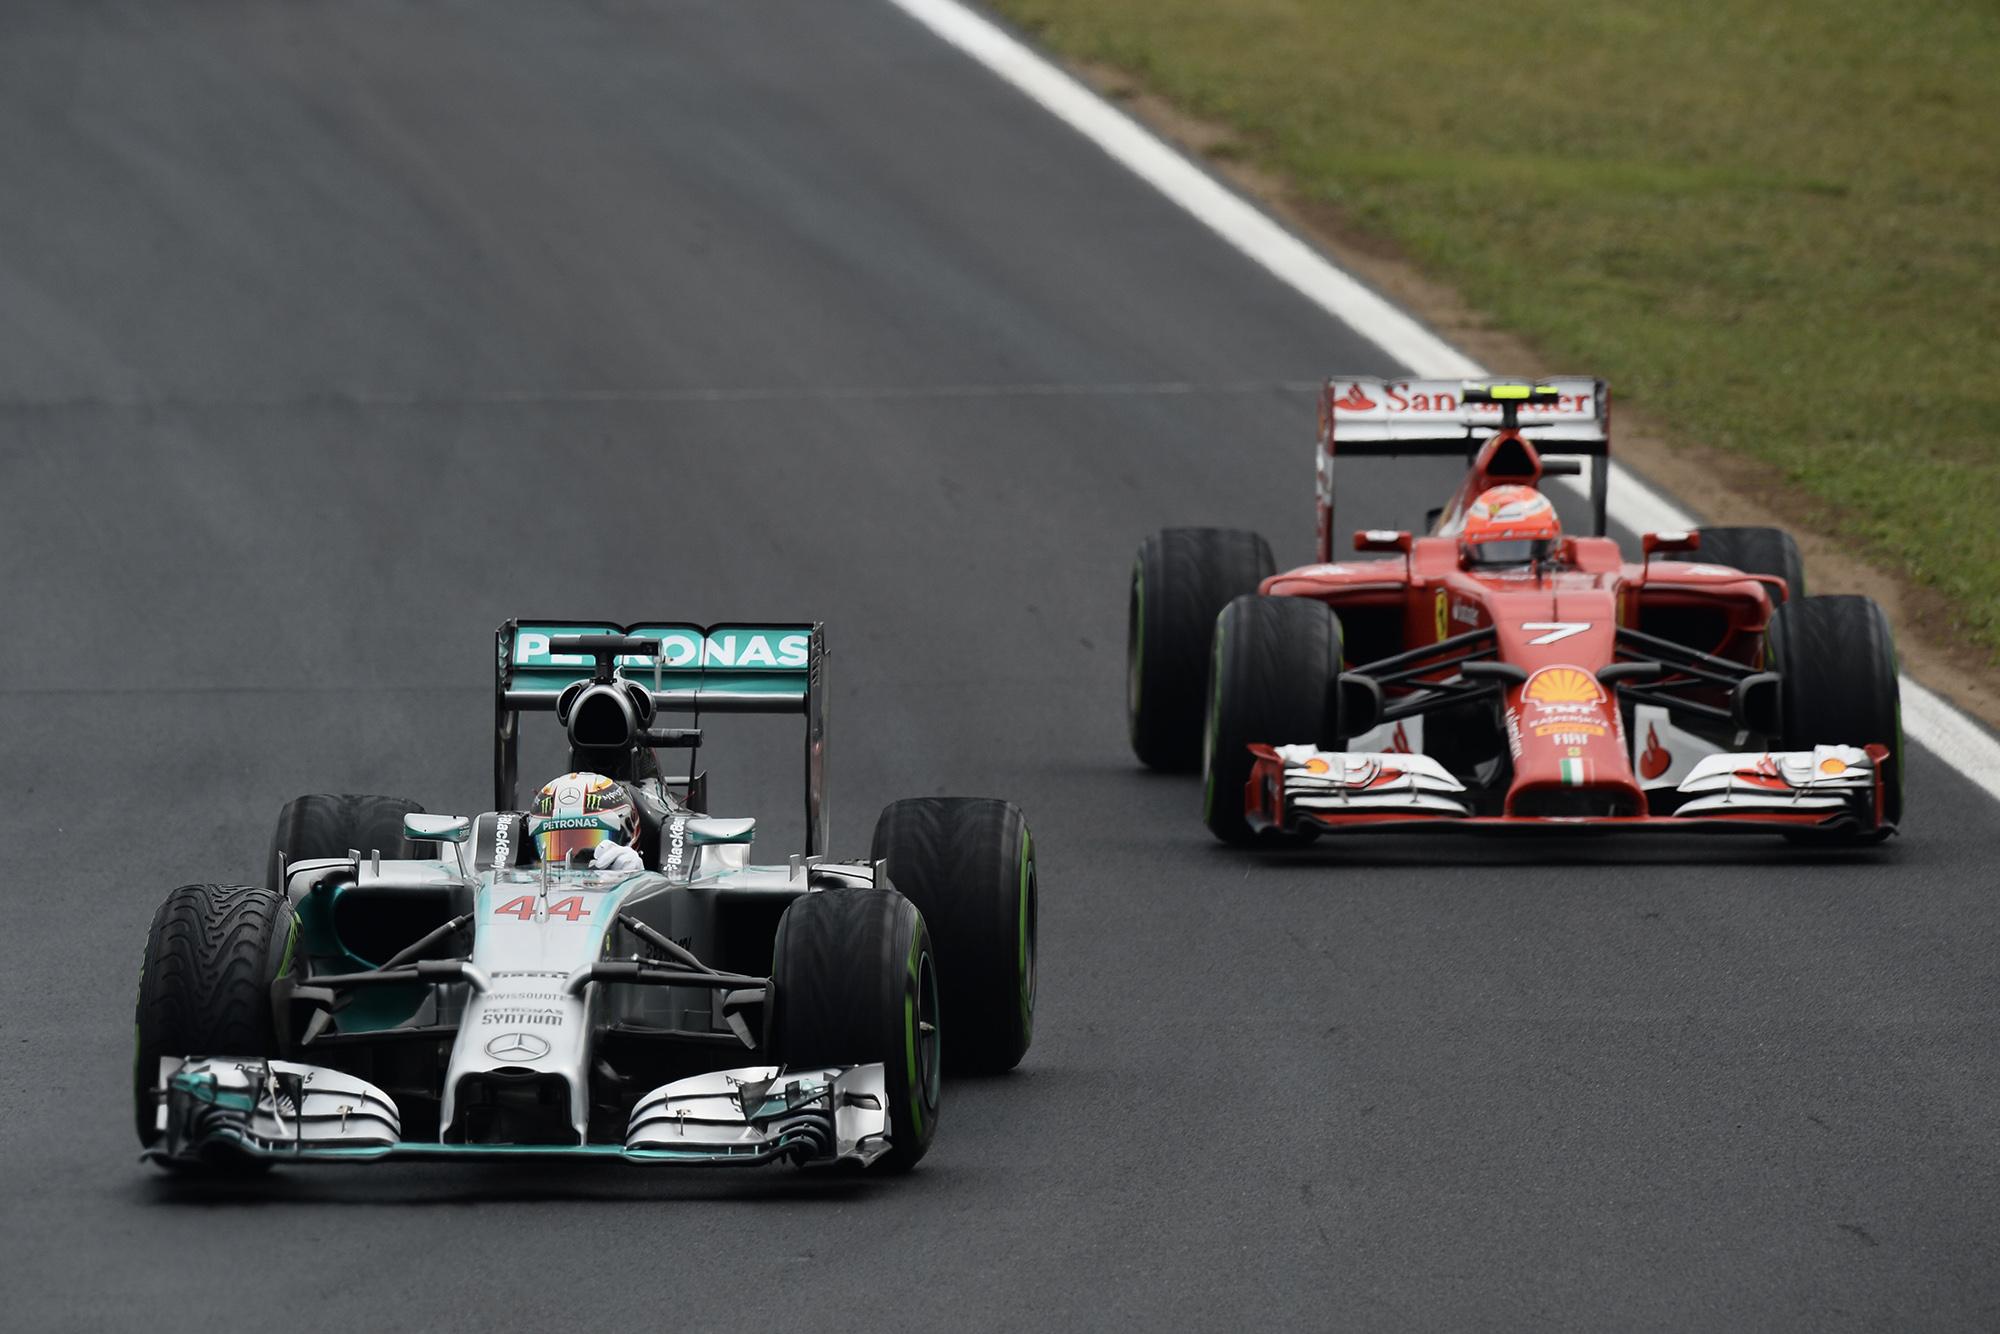 Lewis Hamilton ahead of Kimi Raikkonen's Ferrari in the 2014 F1 season